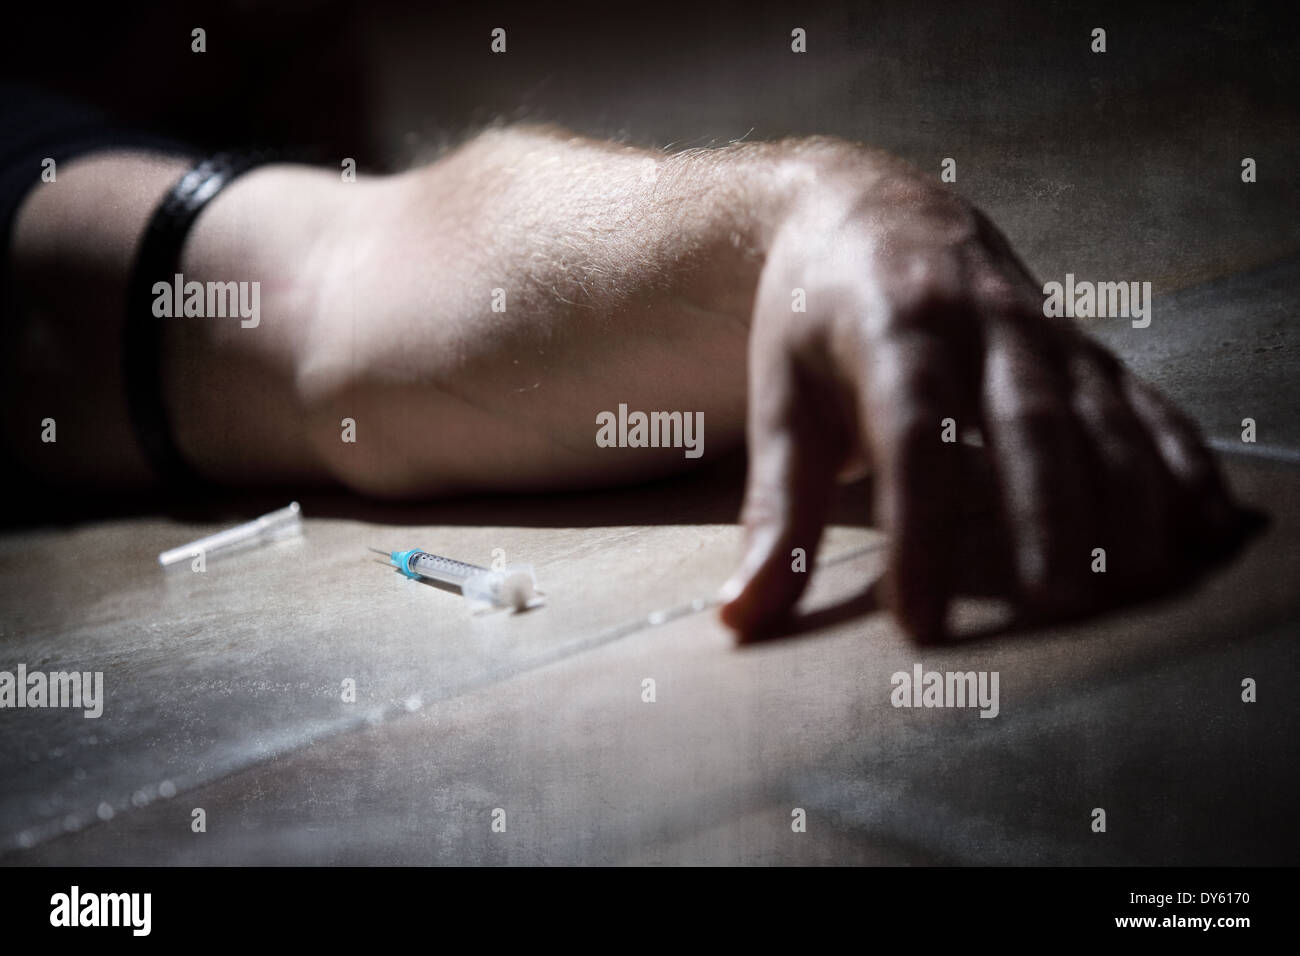 Abuso di farmaci Immagini Stock